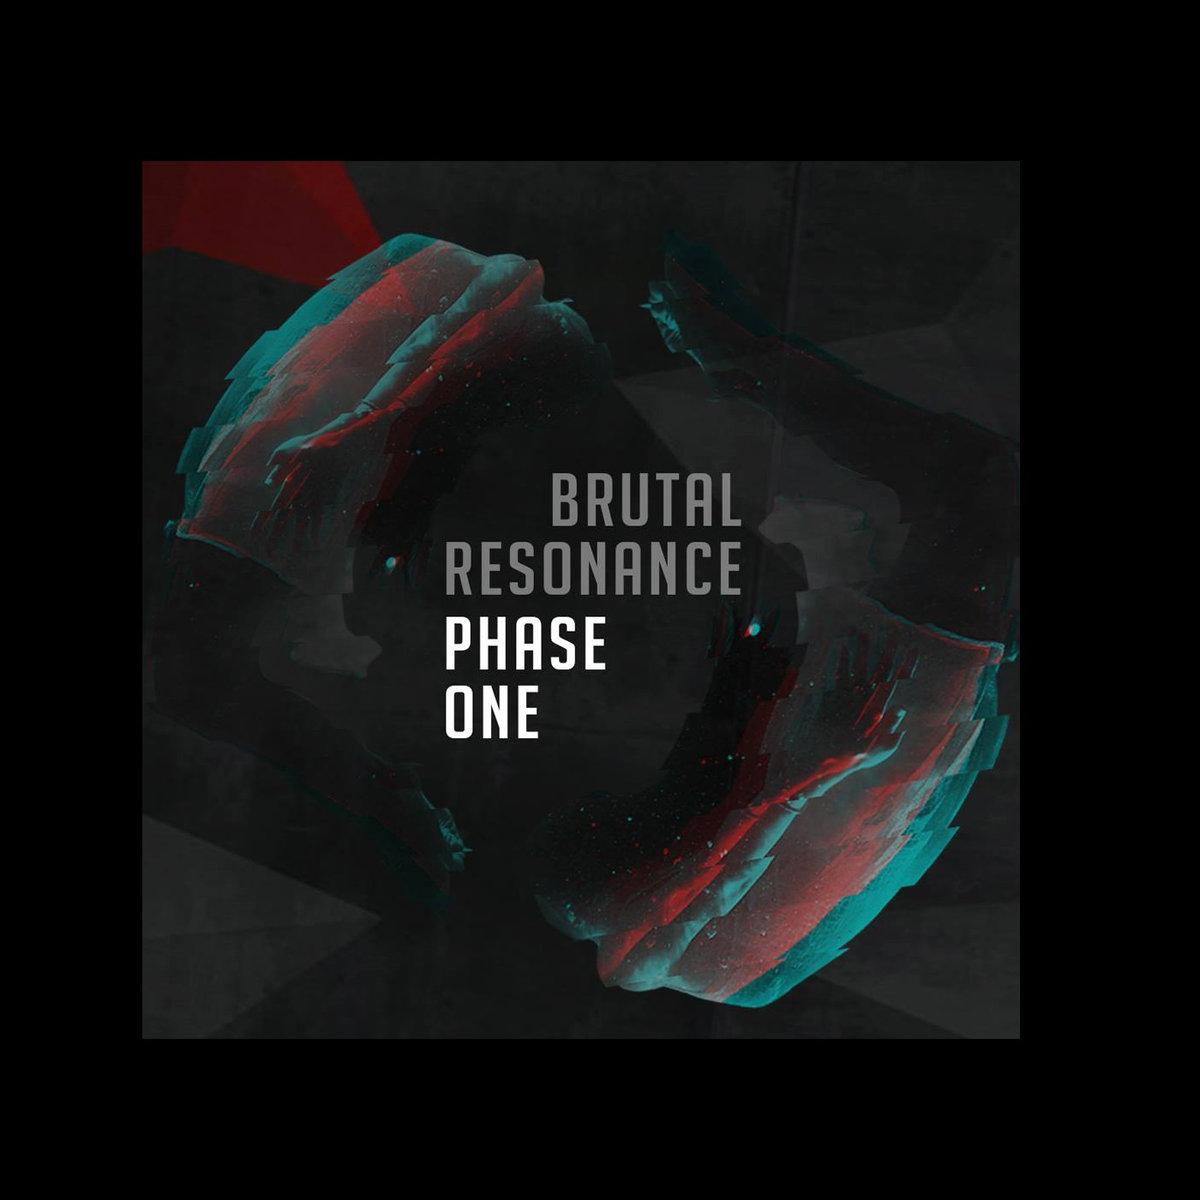 brutal_resonance_phase_one